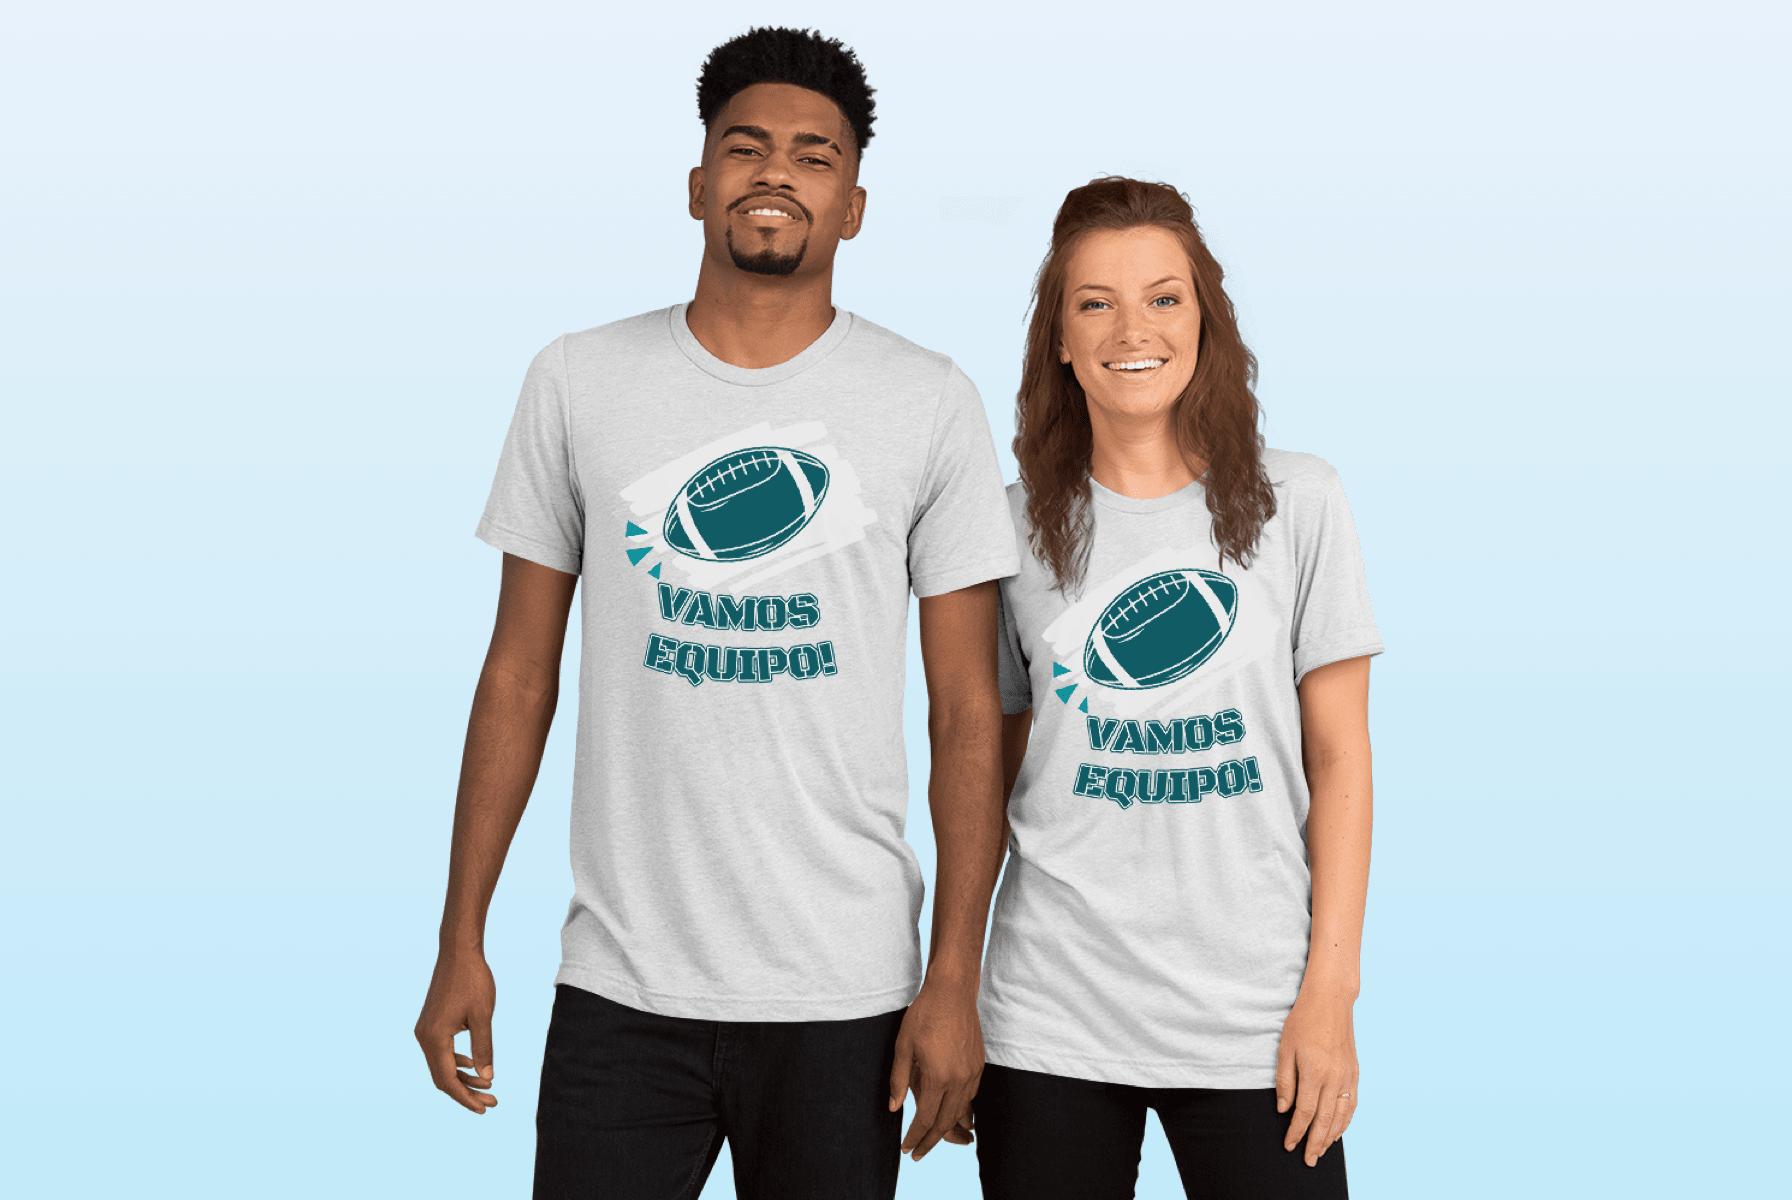 Camisetas de equipo estudiantil